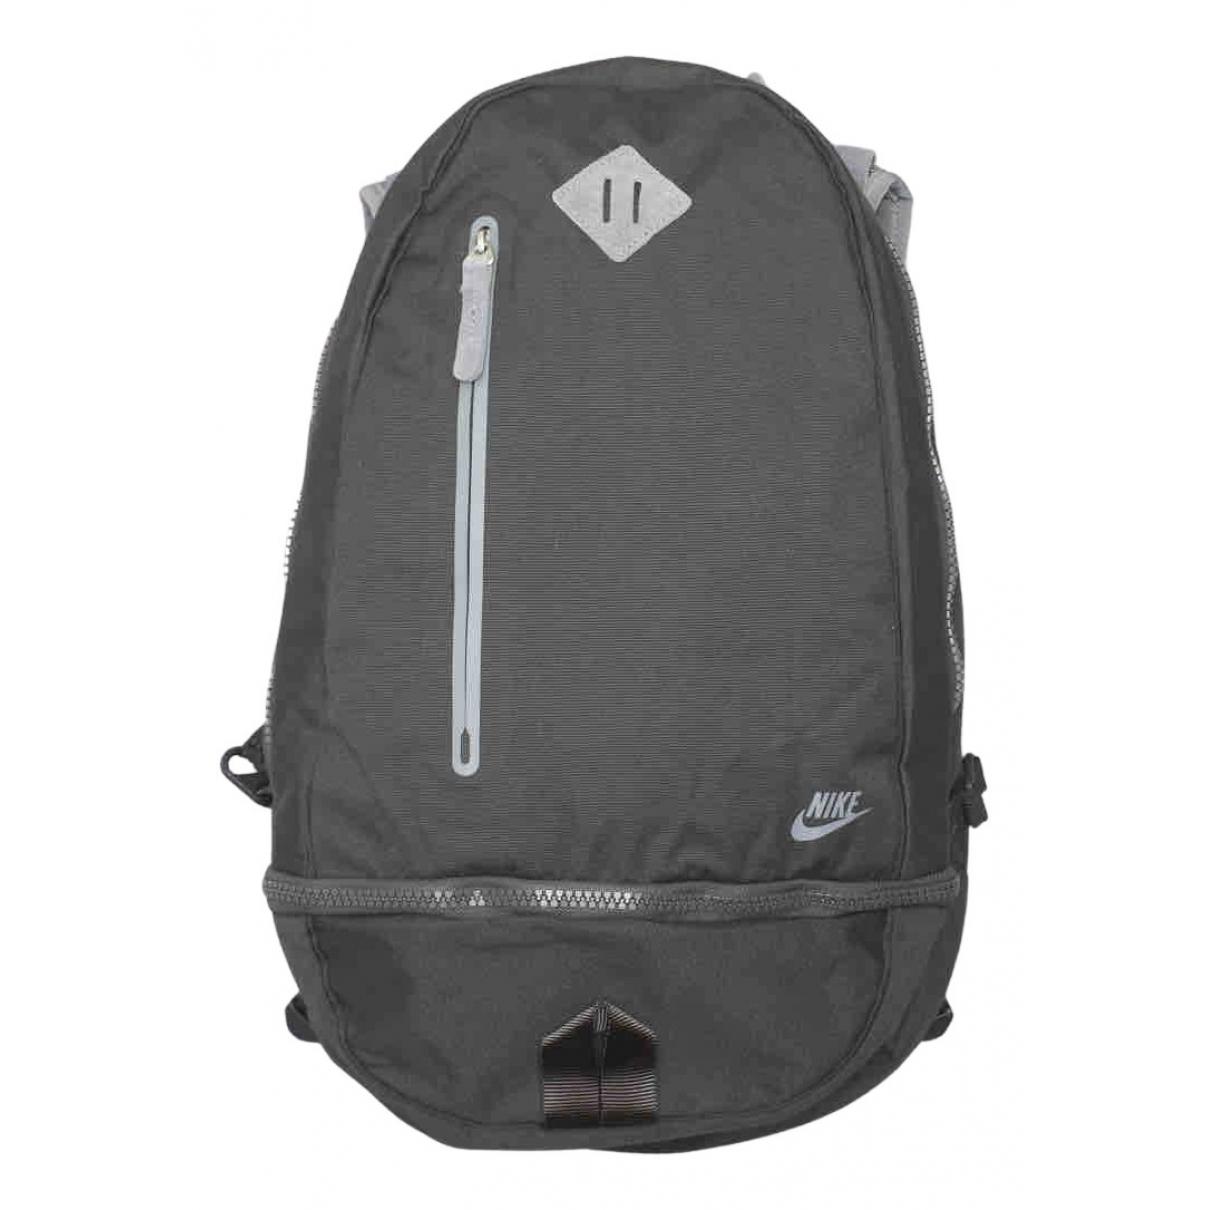 Nike N Anthracite bag for Men N